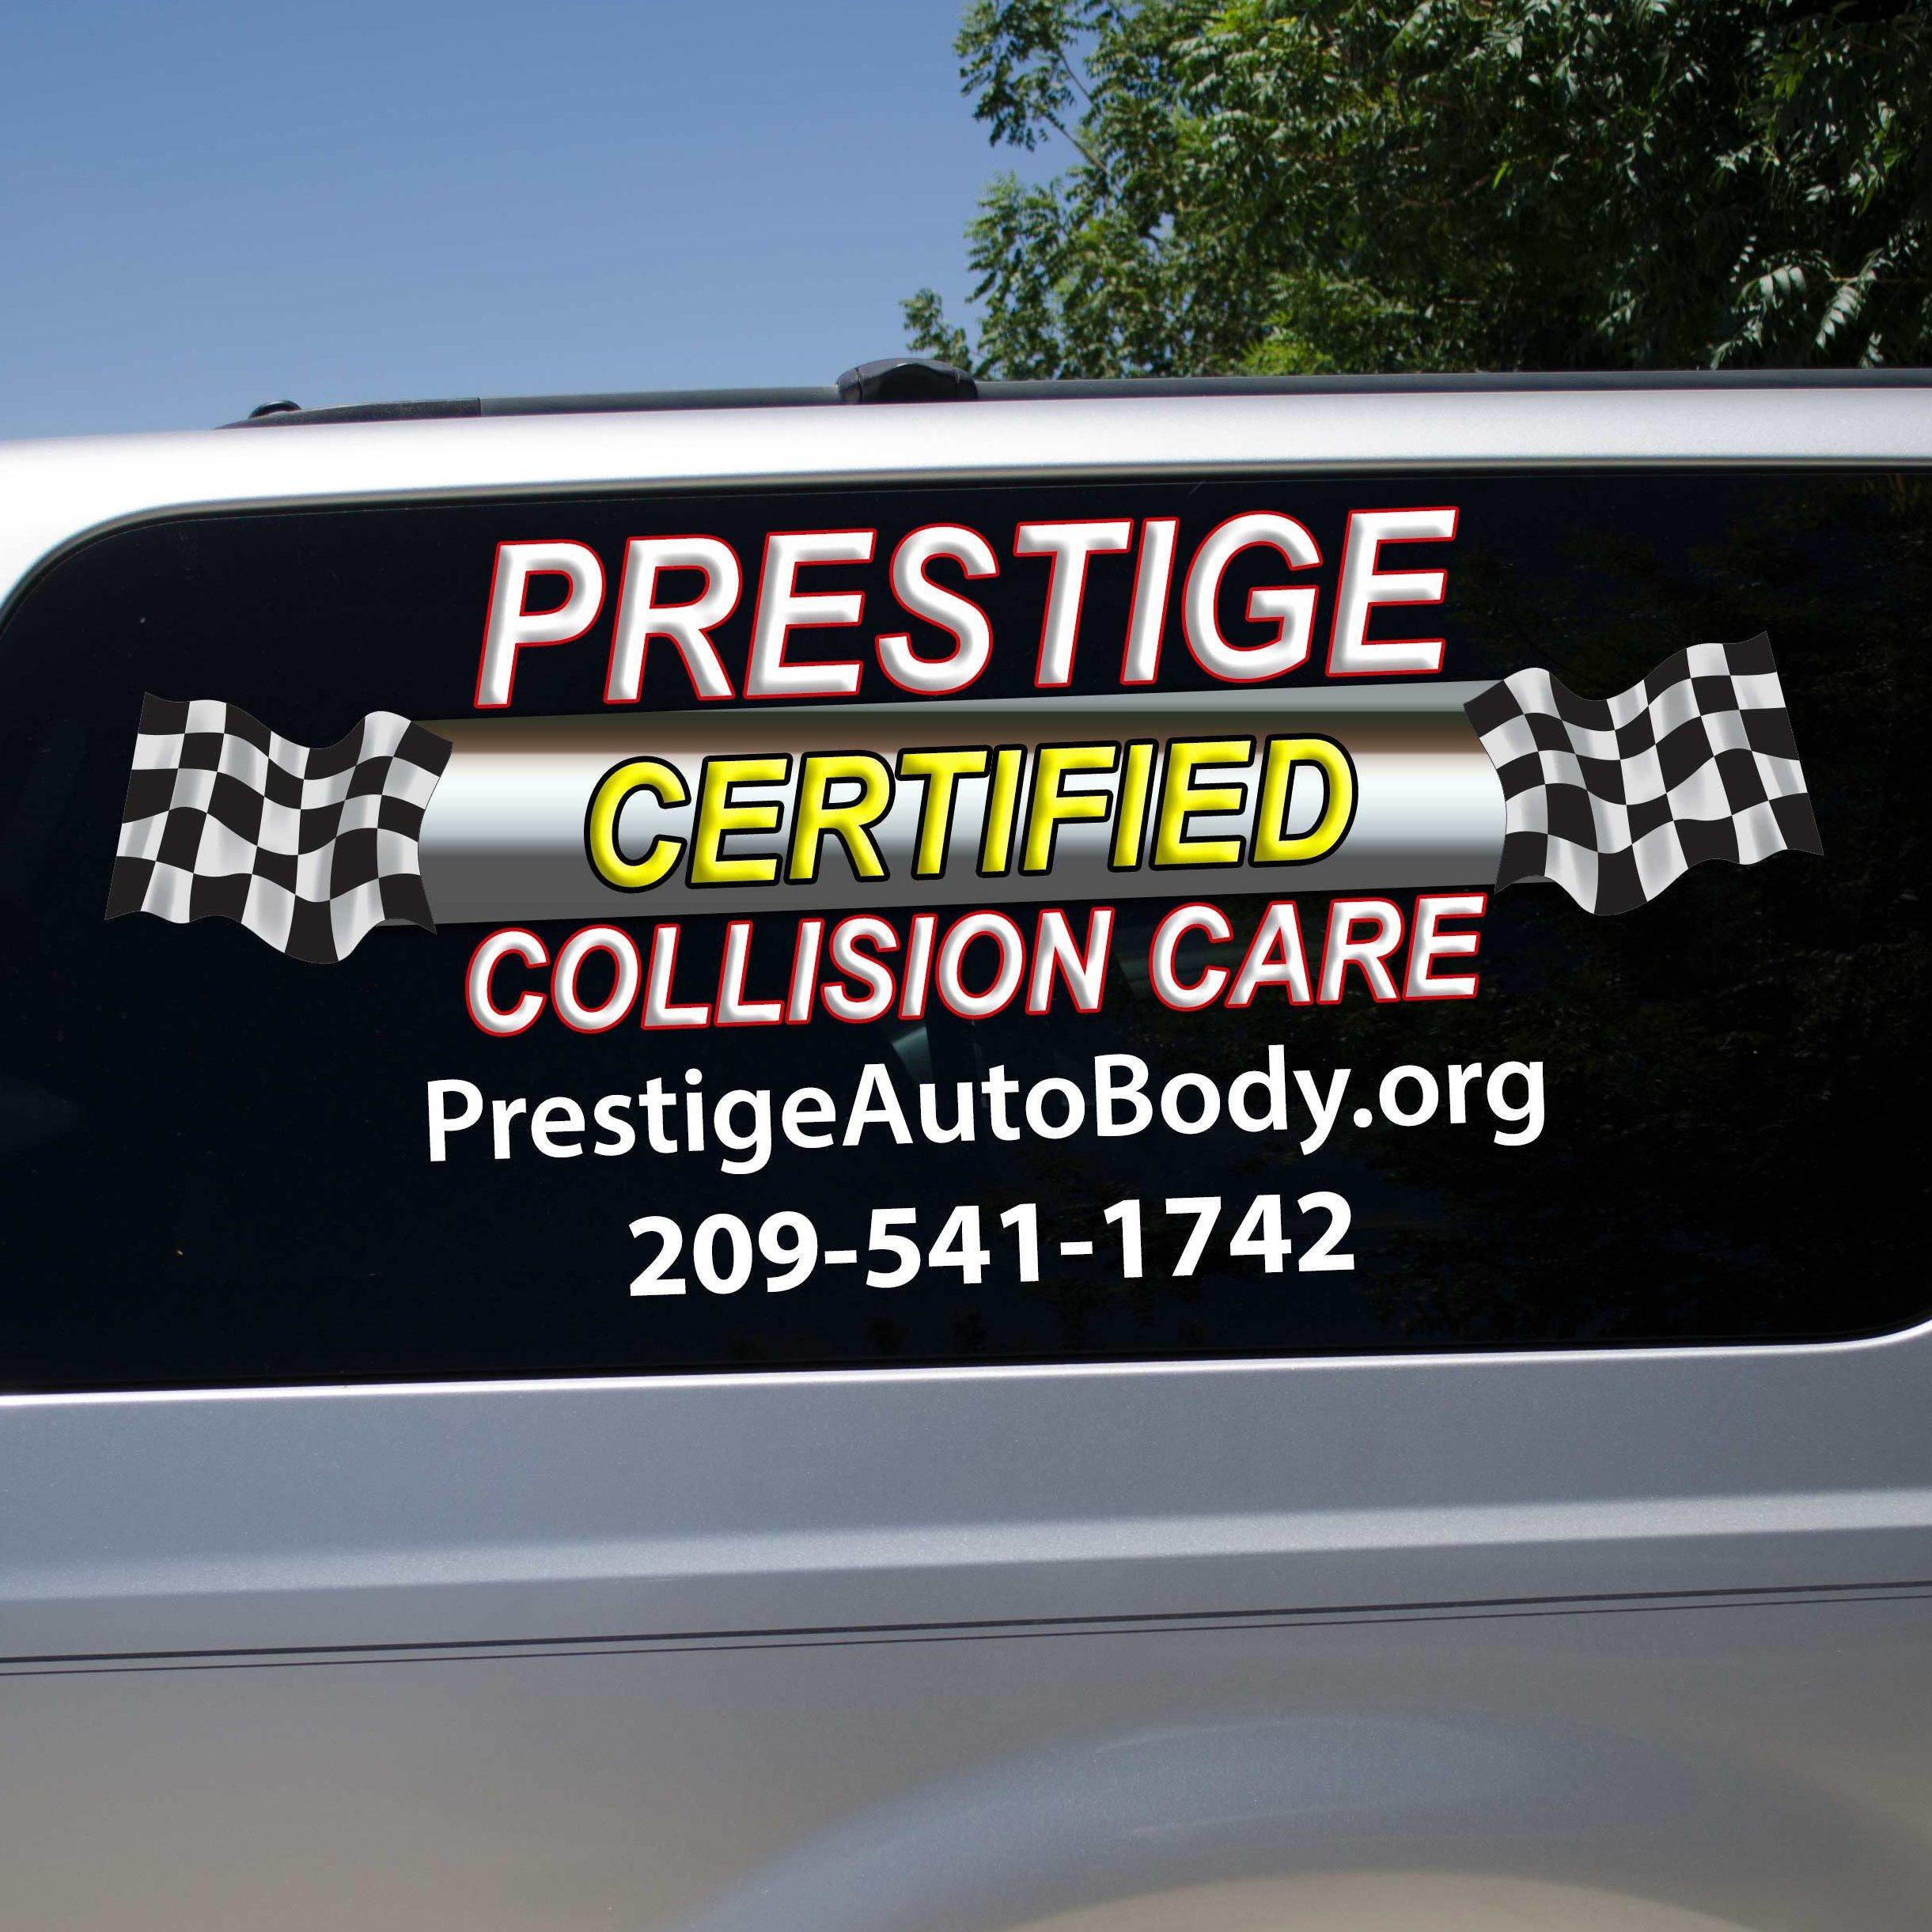 Prestige Auto Body & Frame - CERES, CA - Auto Body Repair & Painting